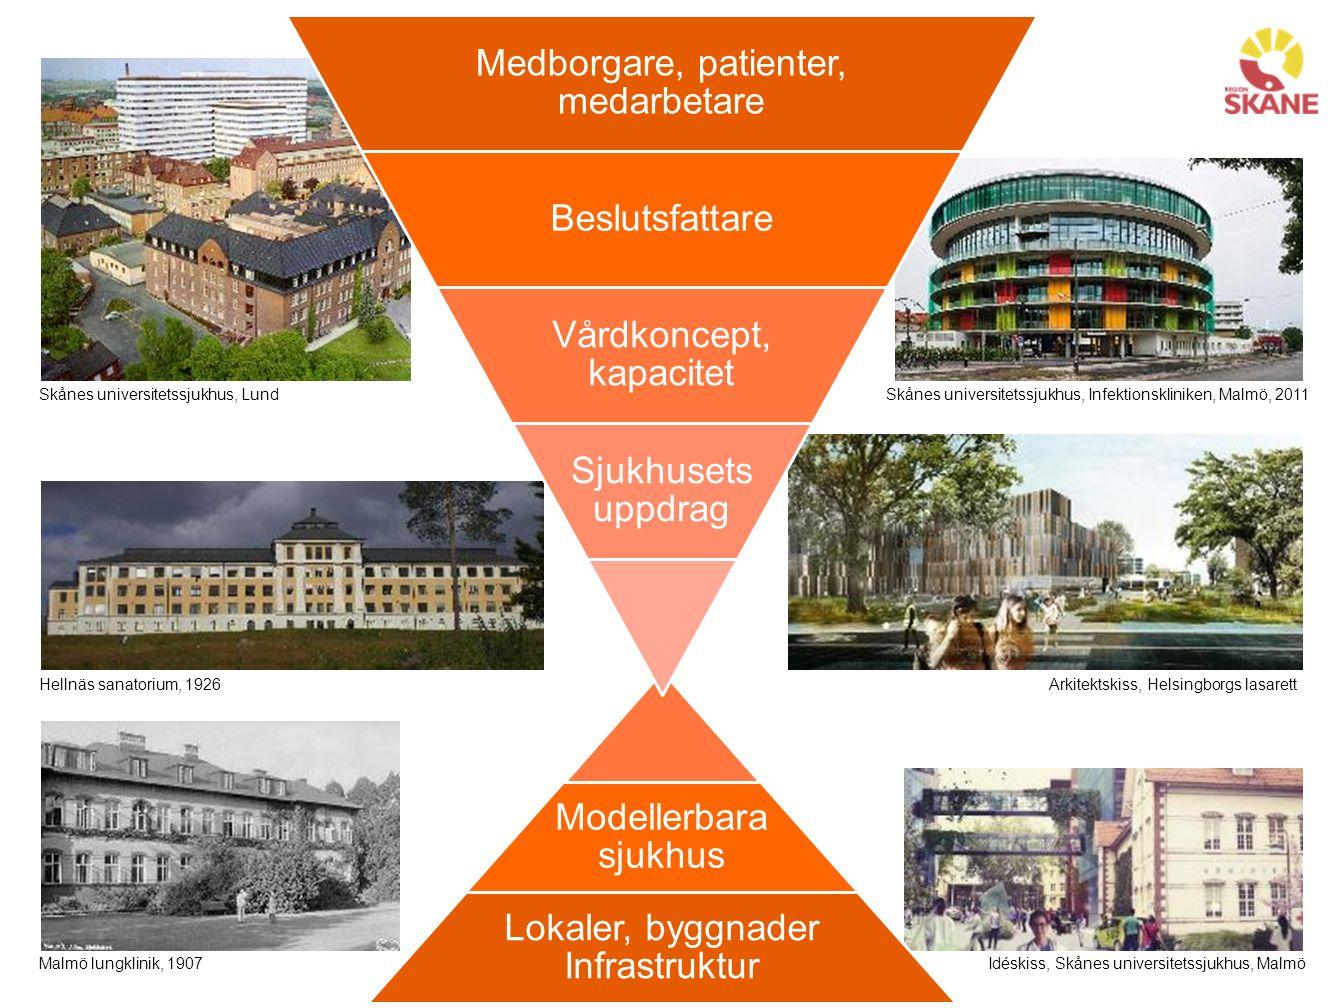 Modellerbara sjukhus Lokaler, byggnader Infrastruktur Skånes universitetssjukhus, Lund Idéskiss, Skånes universitetssjukhus, Malmö Arkitektskiss, Hels